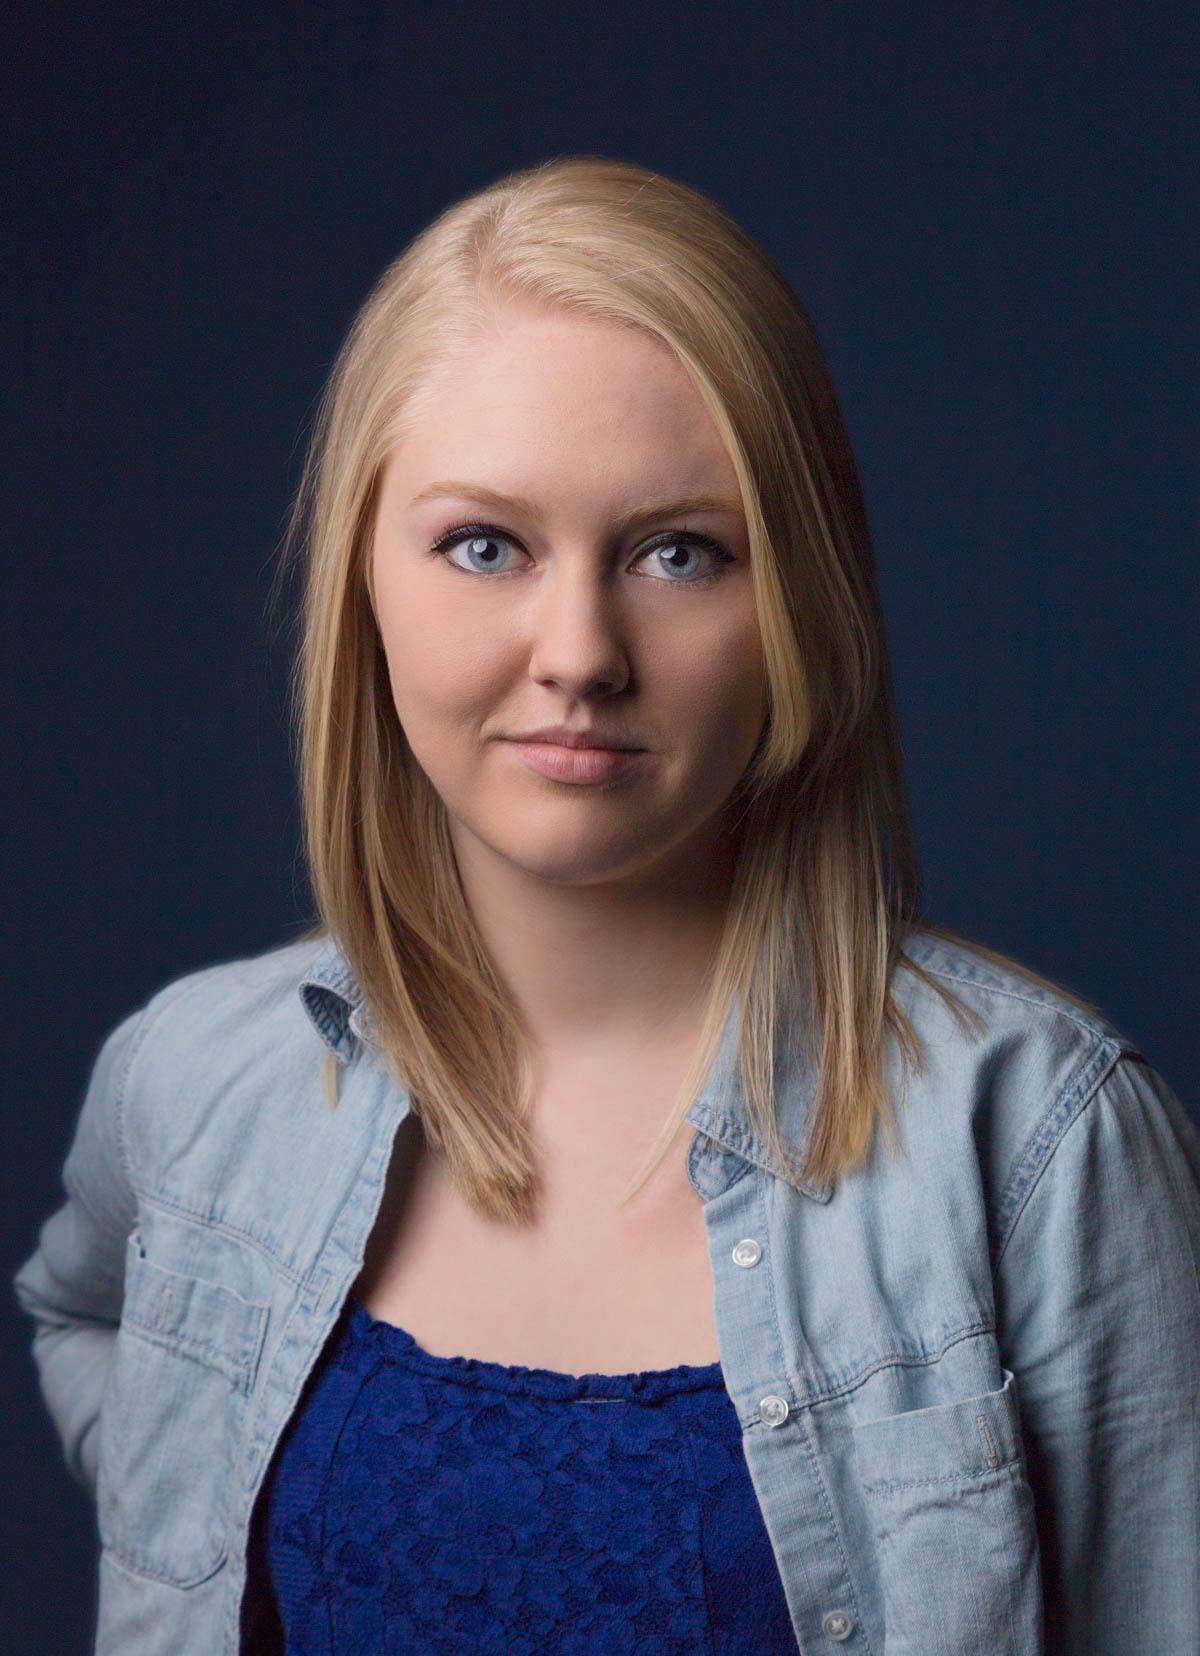 spokane-photographer-chris-thompson-photography